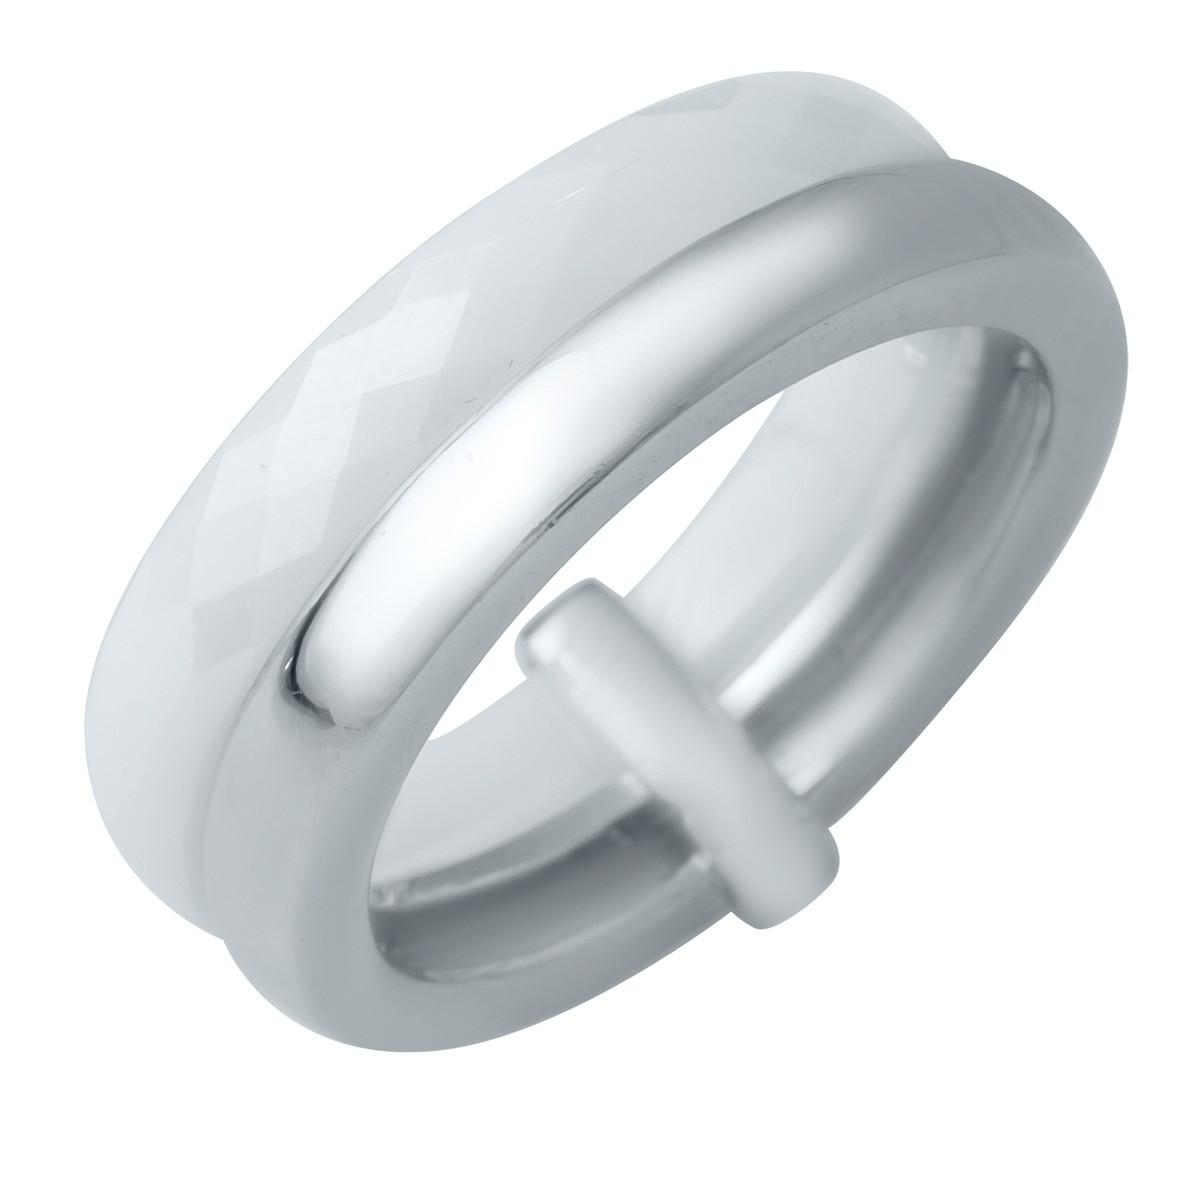 Серебряное кольцо DreamJewelry с керамикой (1150788) 19 размер